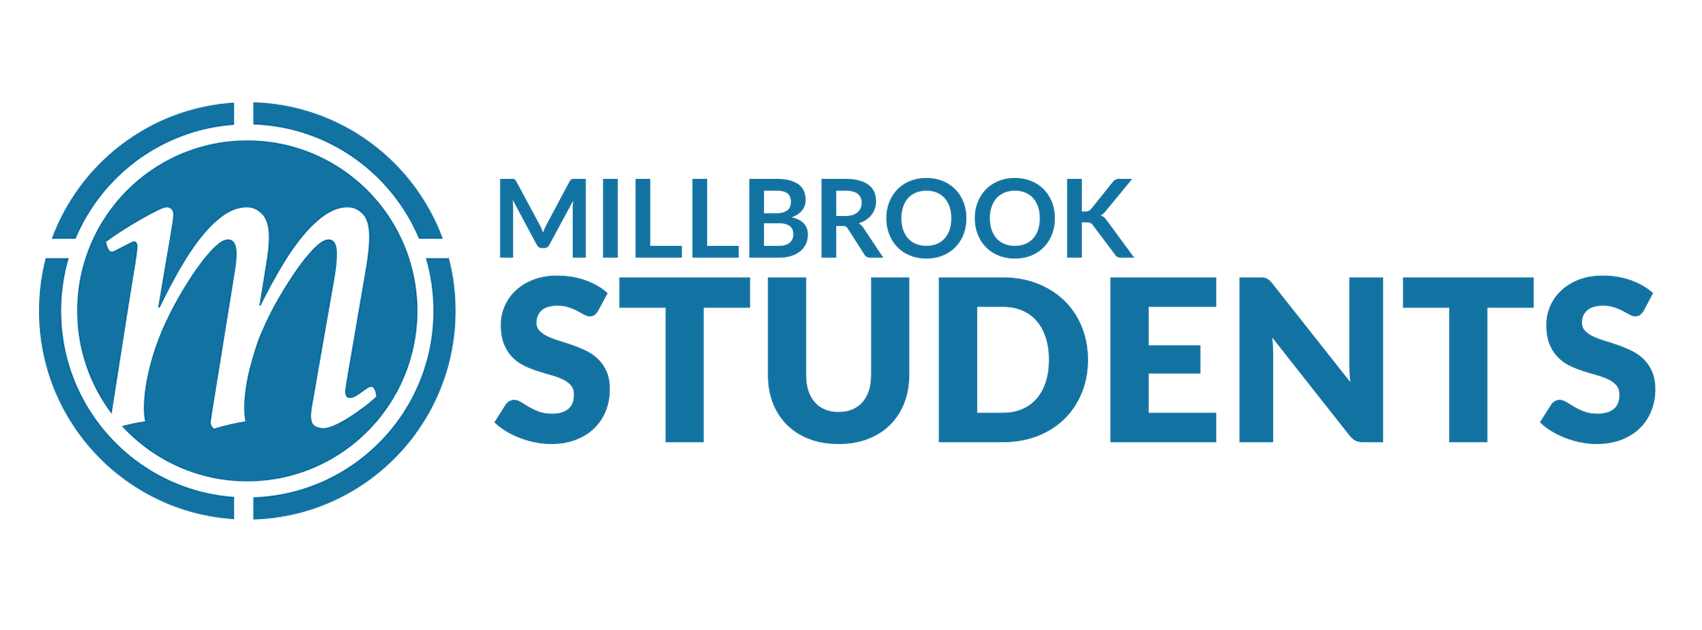 millbrook single girls Millbrook hs track venue records  millbrook tri meet : 2011-05-13  virginia girls in 800m run jun 22, 2018.